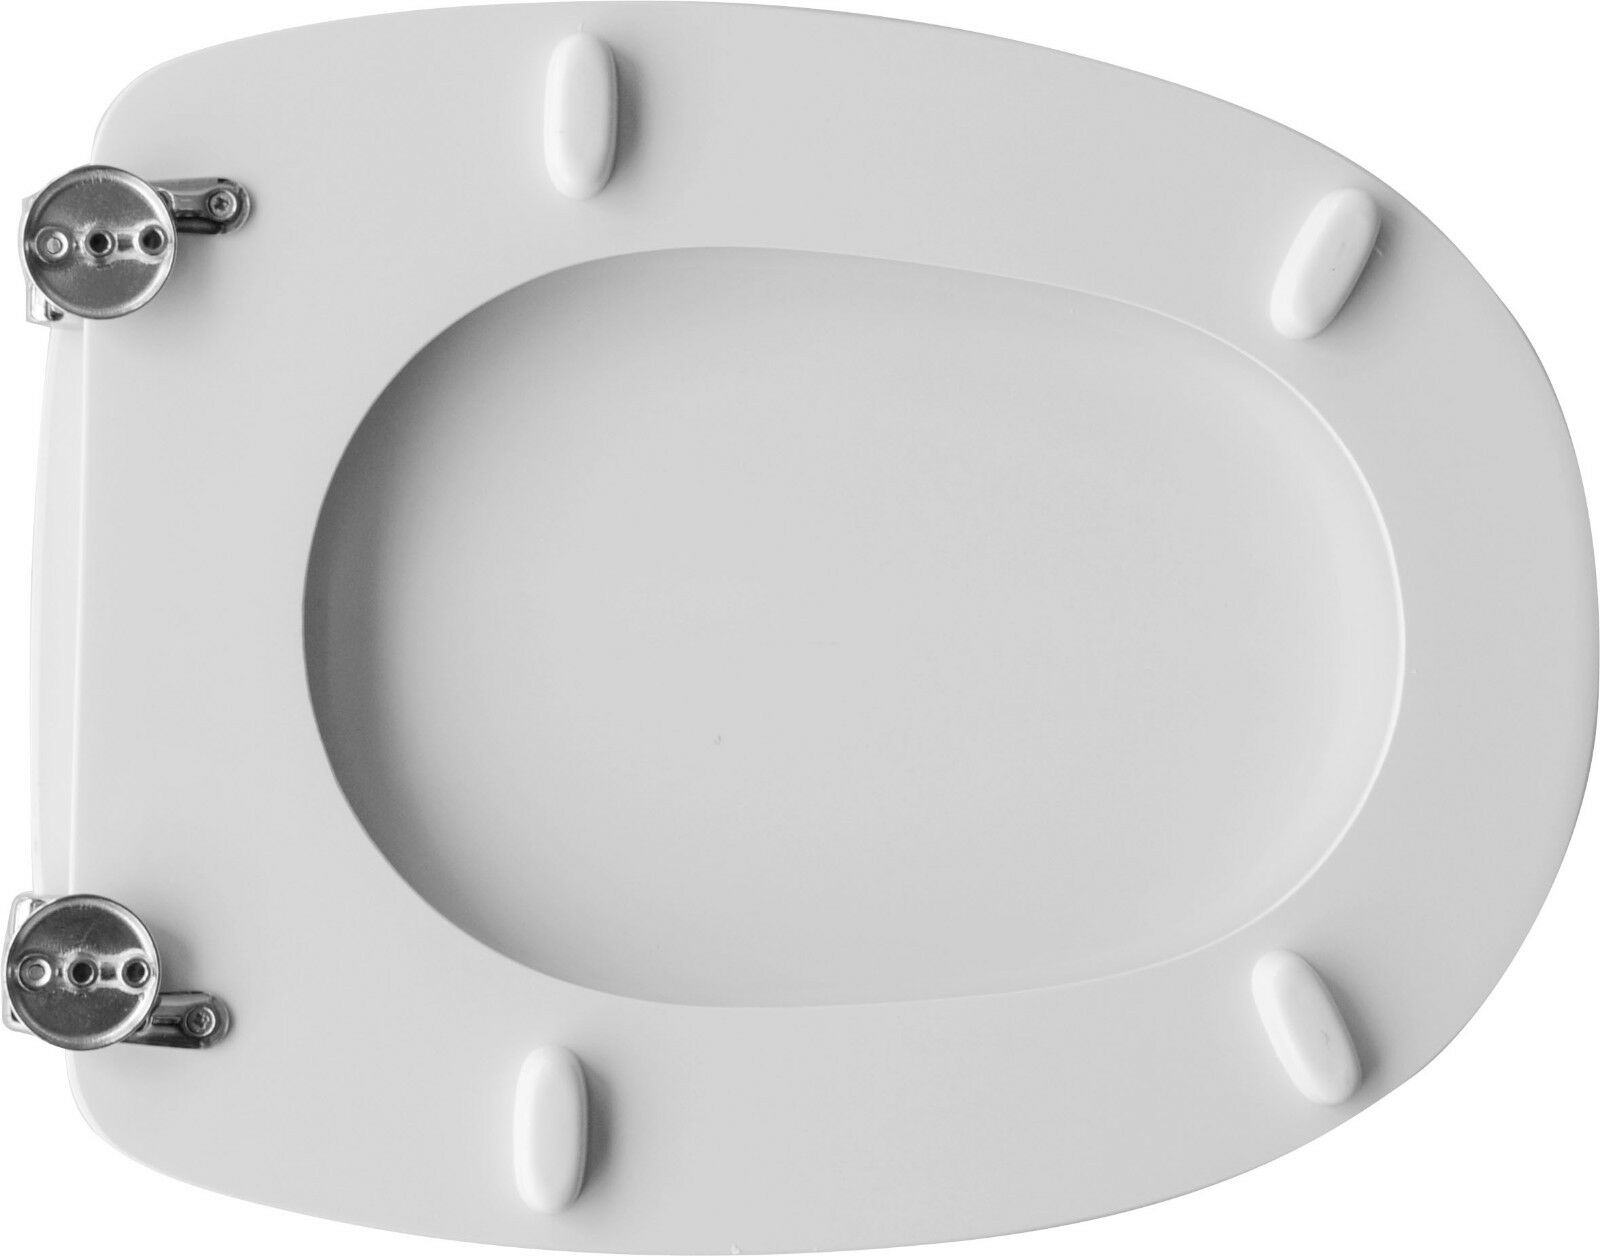 COPRIWATER COPRIWATER COPRIWATER Sedile WC per CATALANO vaso TISSI BIANCO 01ce01